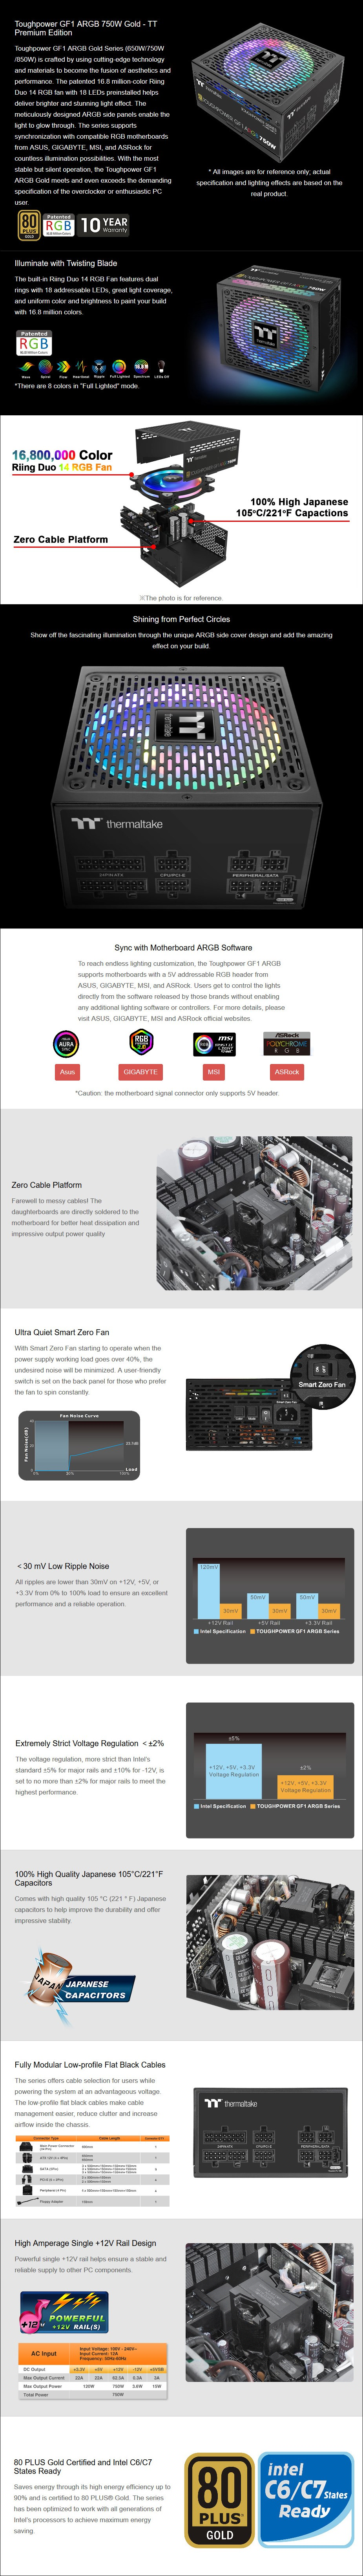 Thermaltake Toughpower GF1 ARGB 750W 80+ Gold Fully Modular Power Supply - Overview 1